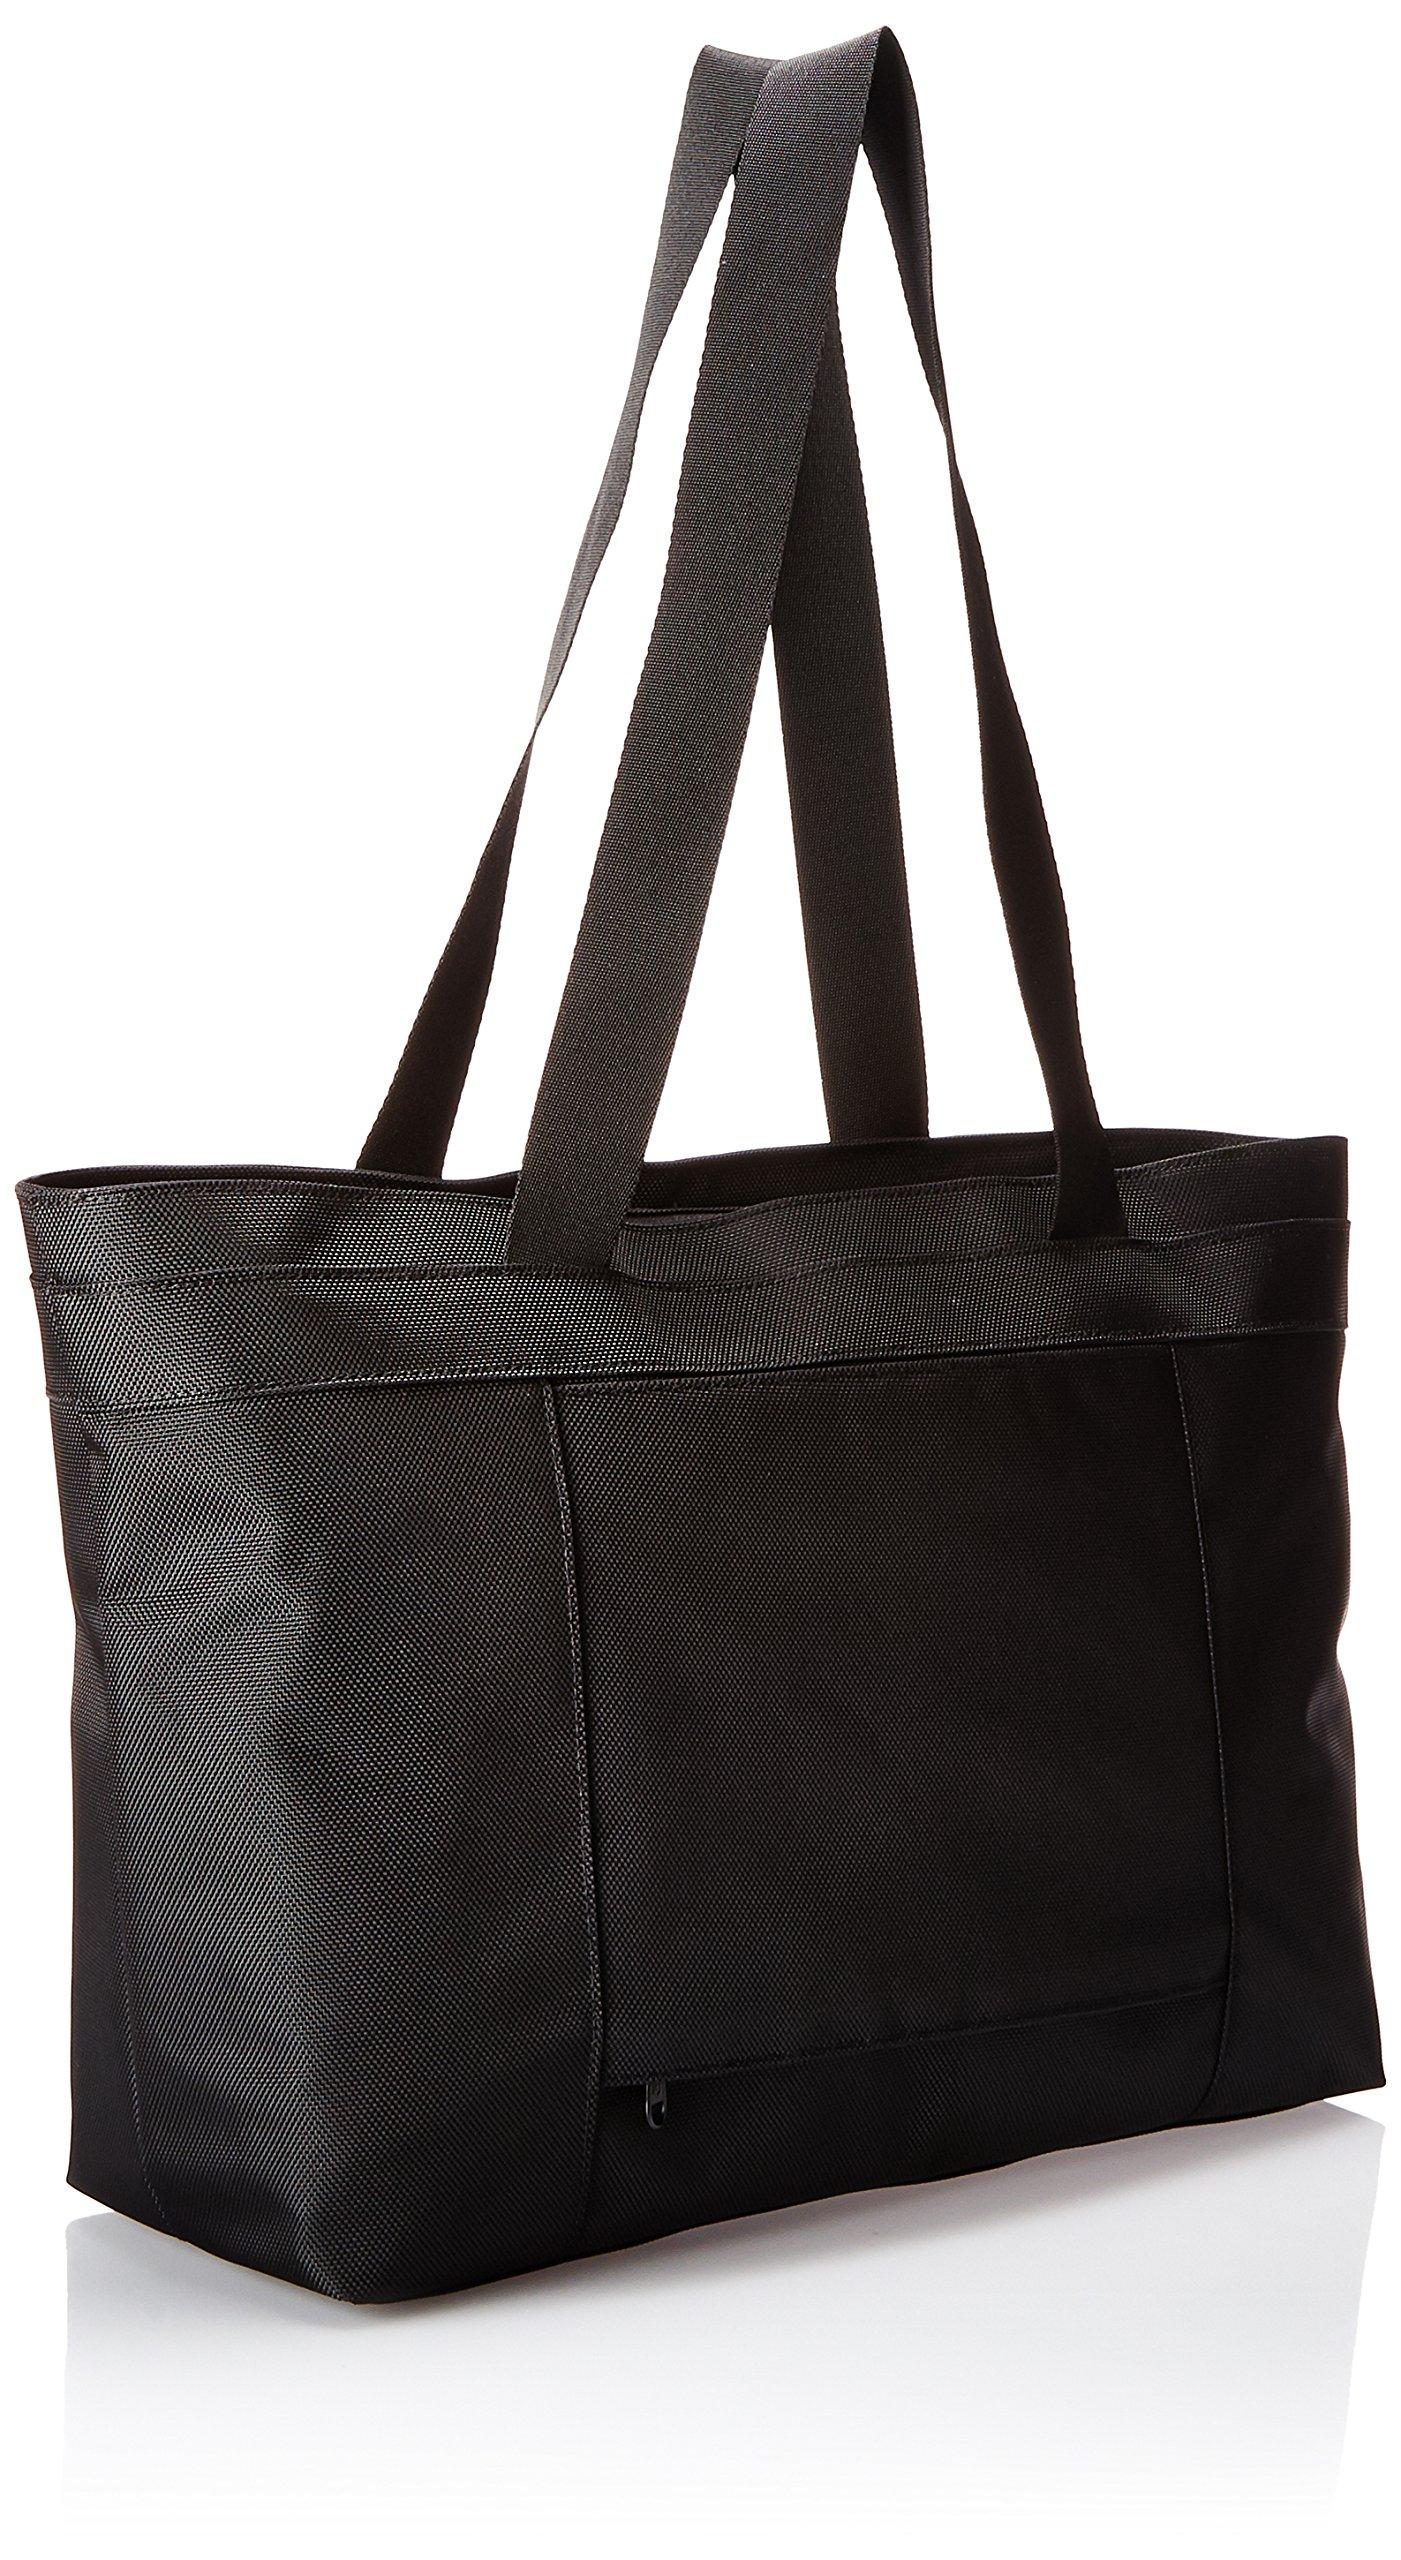 Victorinox Werks Traveler 5.0 WT Shopping Tote, Black, One Size by Victorinox (Image #3)